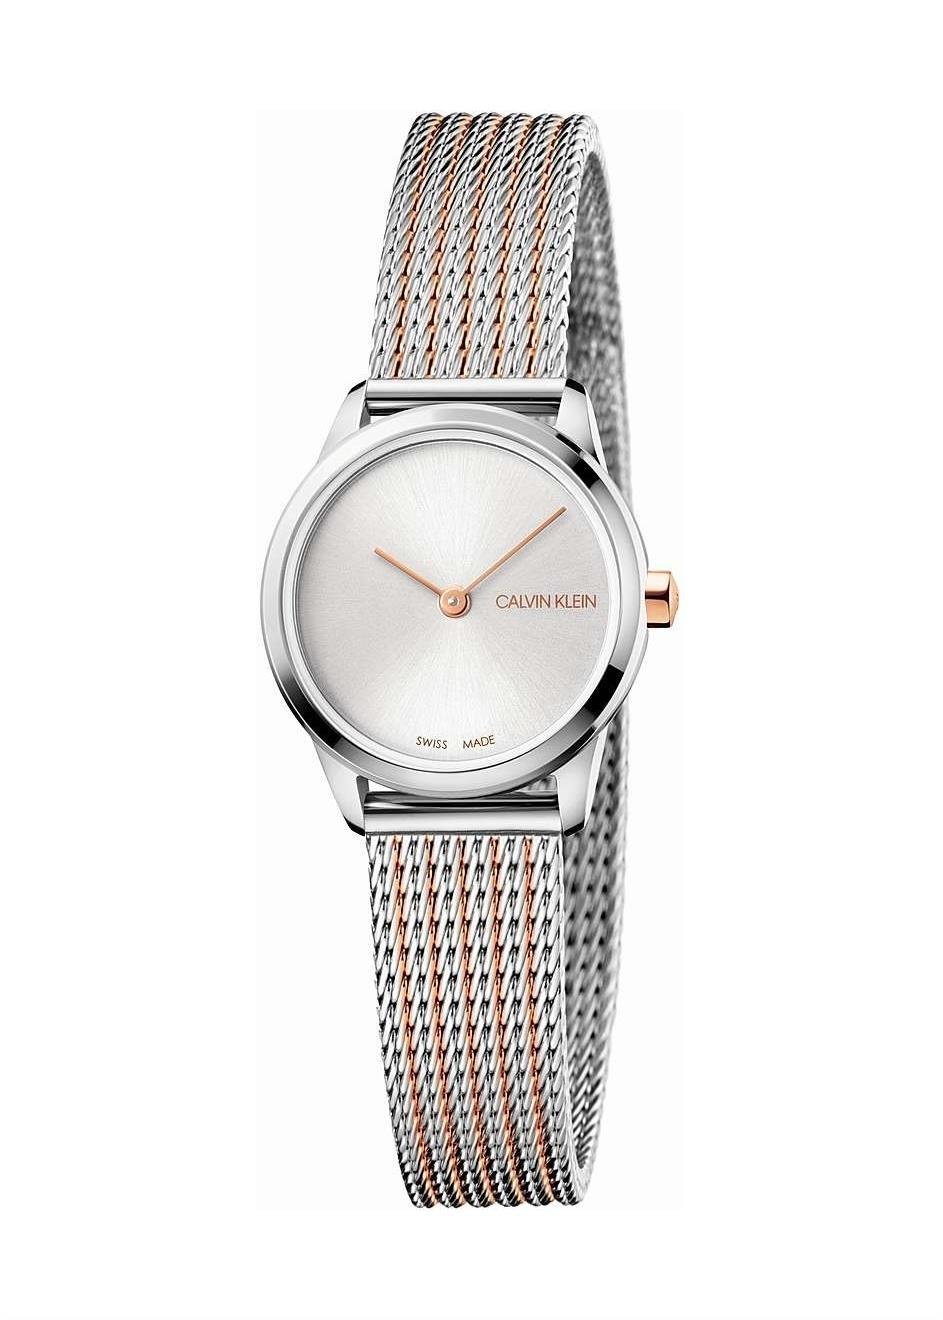 CK CALVIN KLEIN Ladies Wrist Watch Model MINIMAL K3M23B26